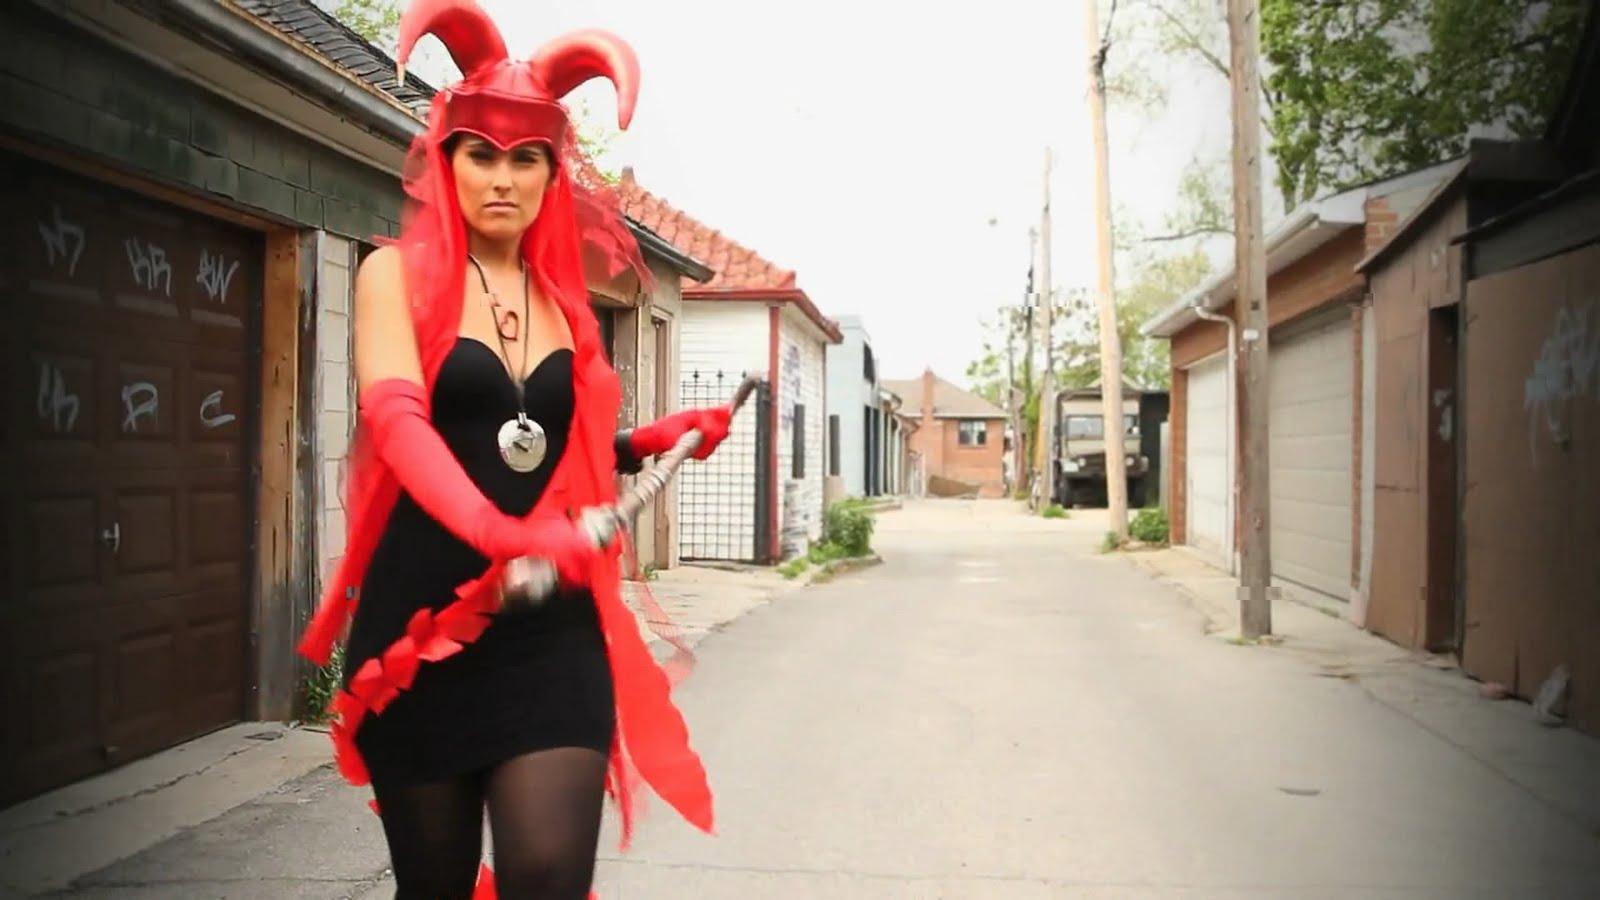 http://1.bp.blogspot.com/_JzQNdWmweVc/TE-Y1QSSXOI/AAAAAAAAAec/j7rsav3SaOE/s1600/Nelly+Furtado+-+Bajo+Otra+Luz+%28feat.+La+Mala+Rodriguez%29+%5BHD+1080p%5D.avi_snapshot_00.19_%5B2010.07.27_20.30.10%5D.jpg